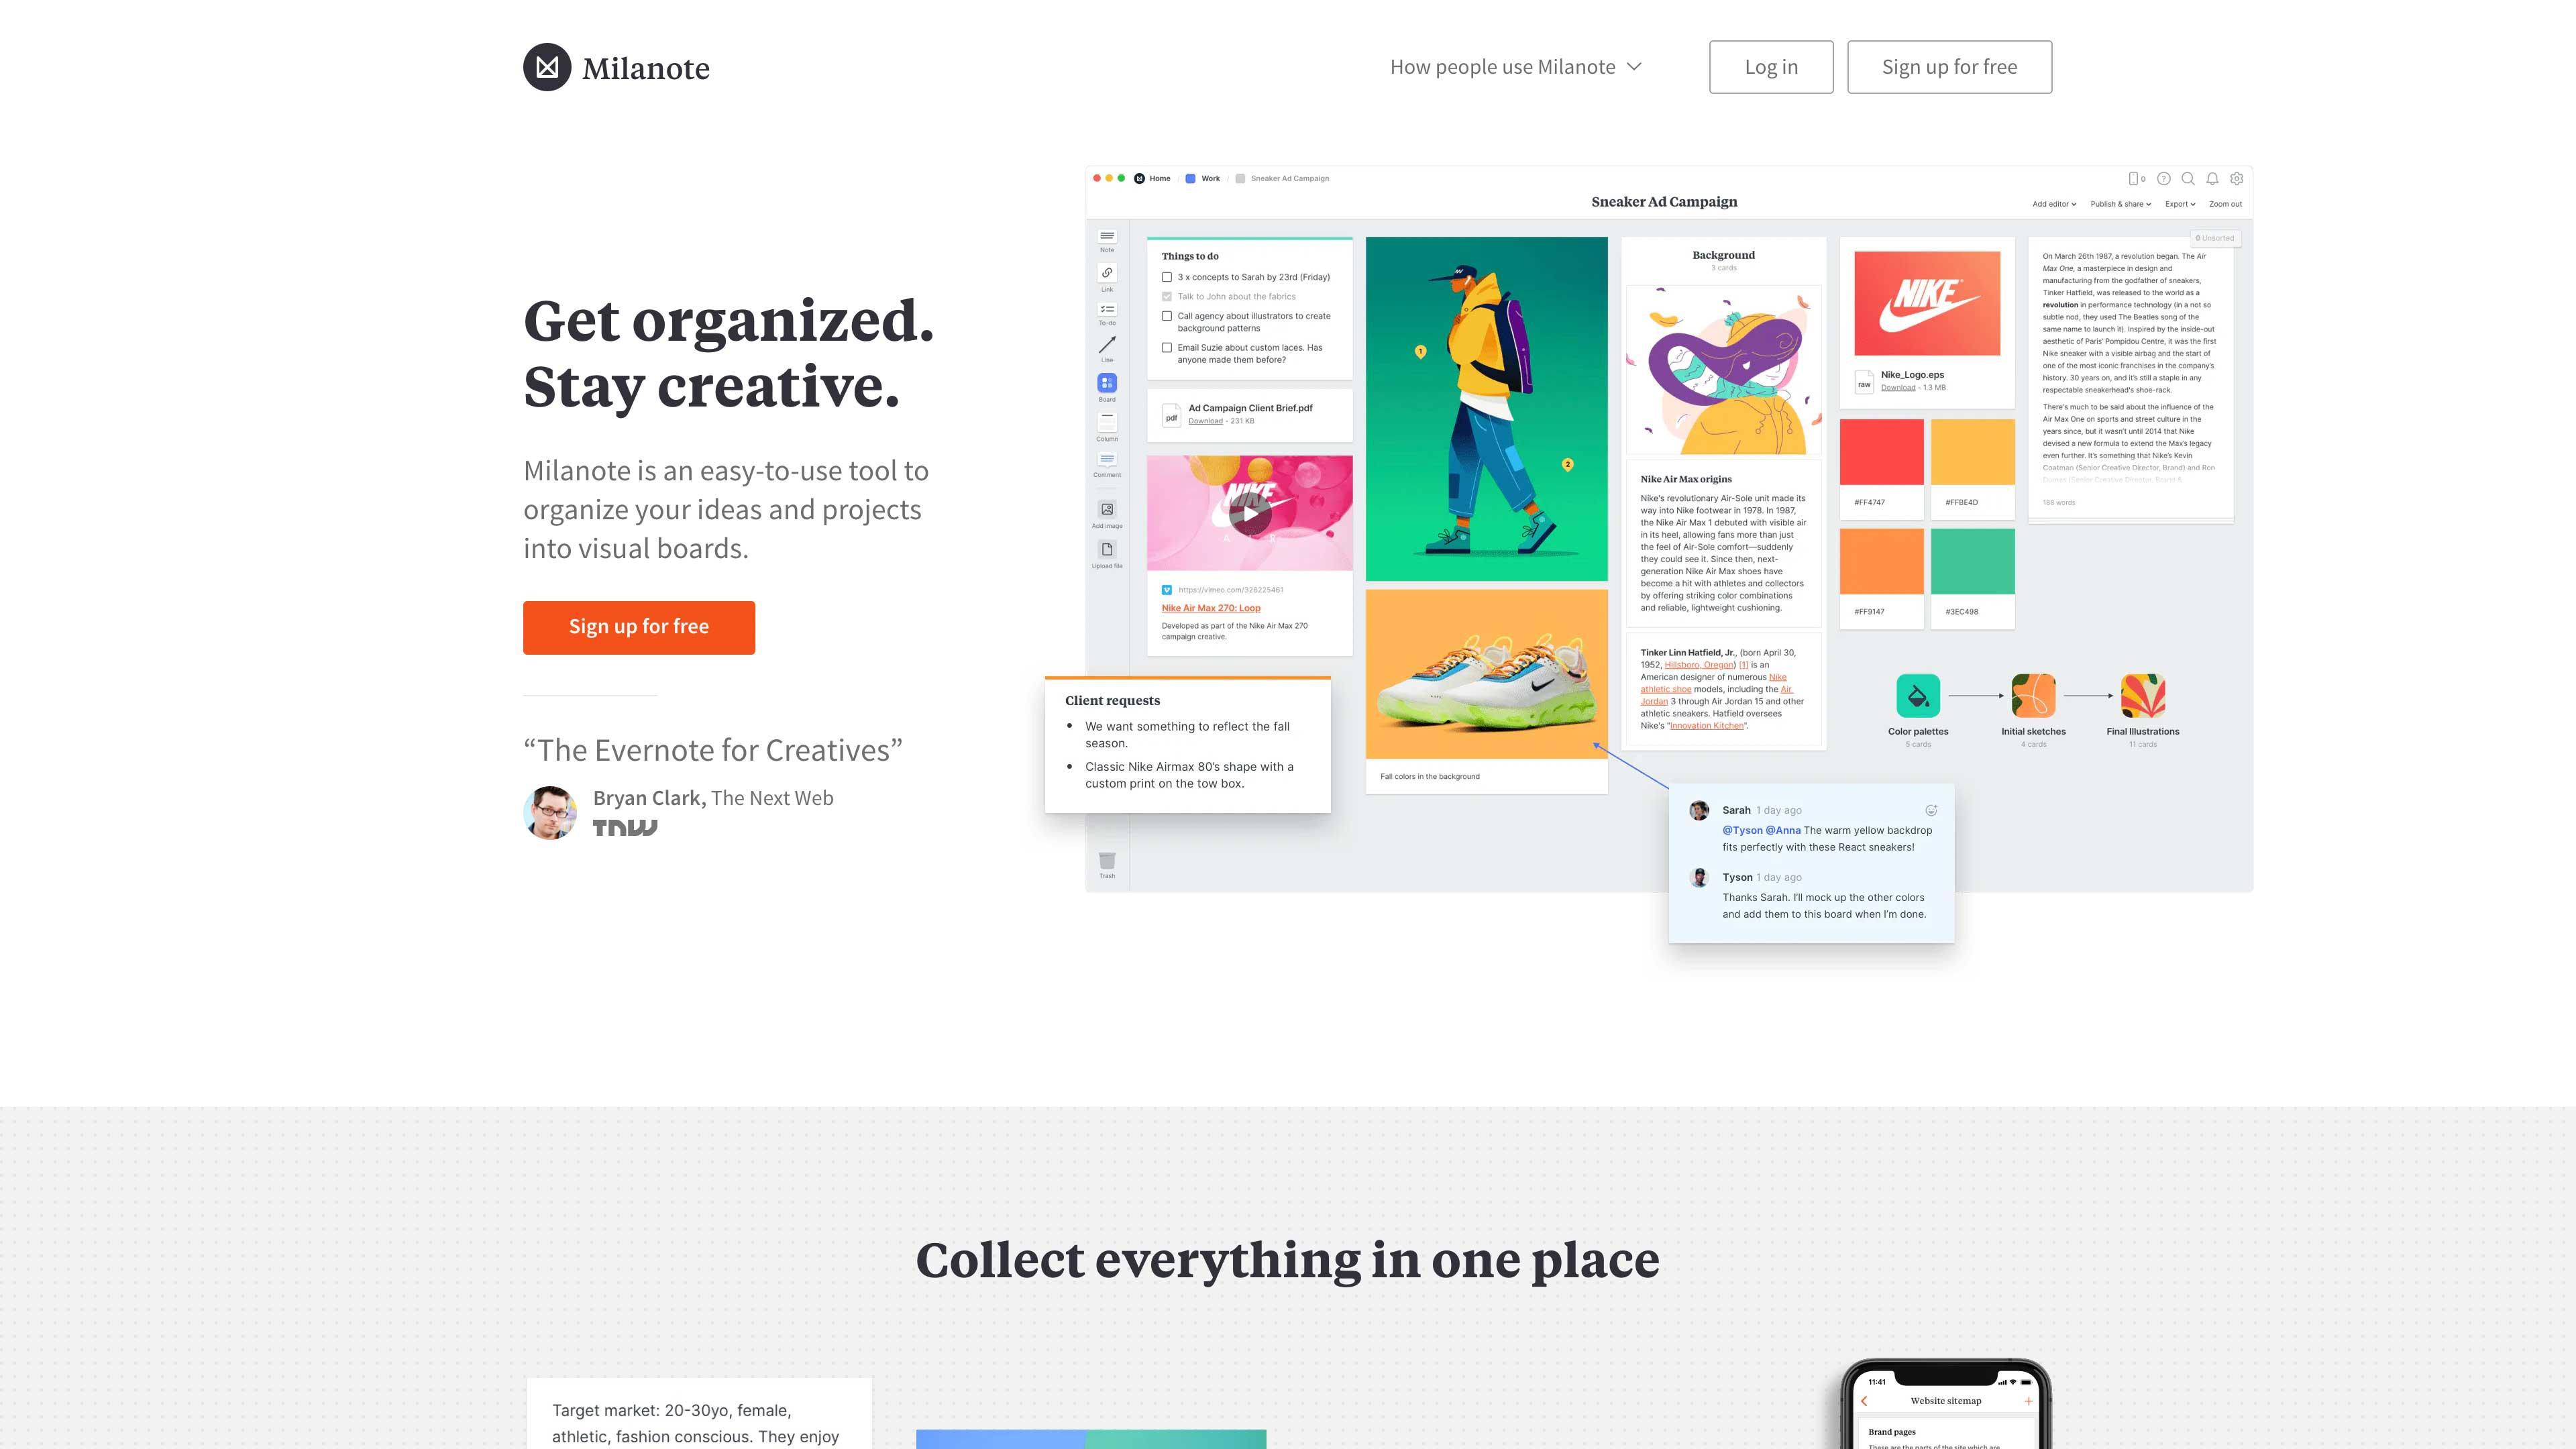 Milanote website.